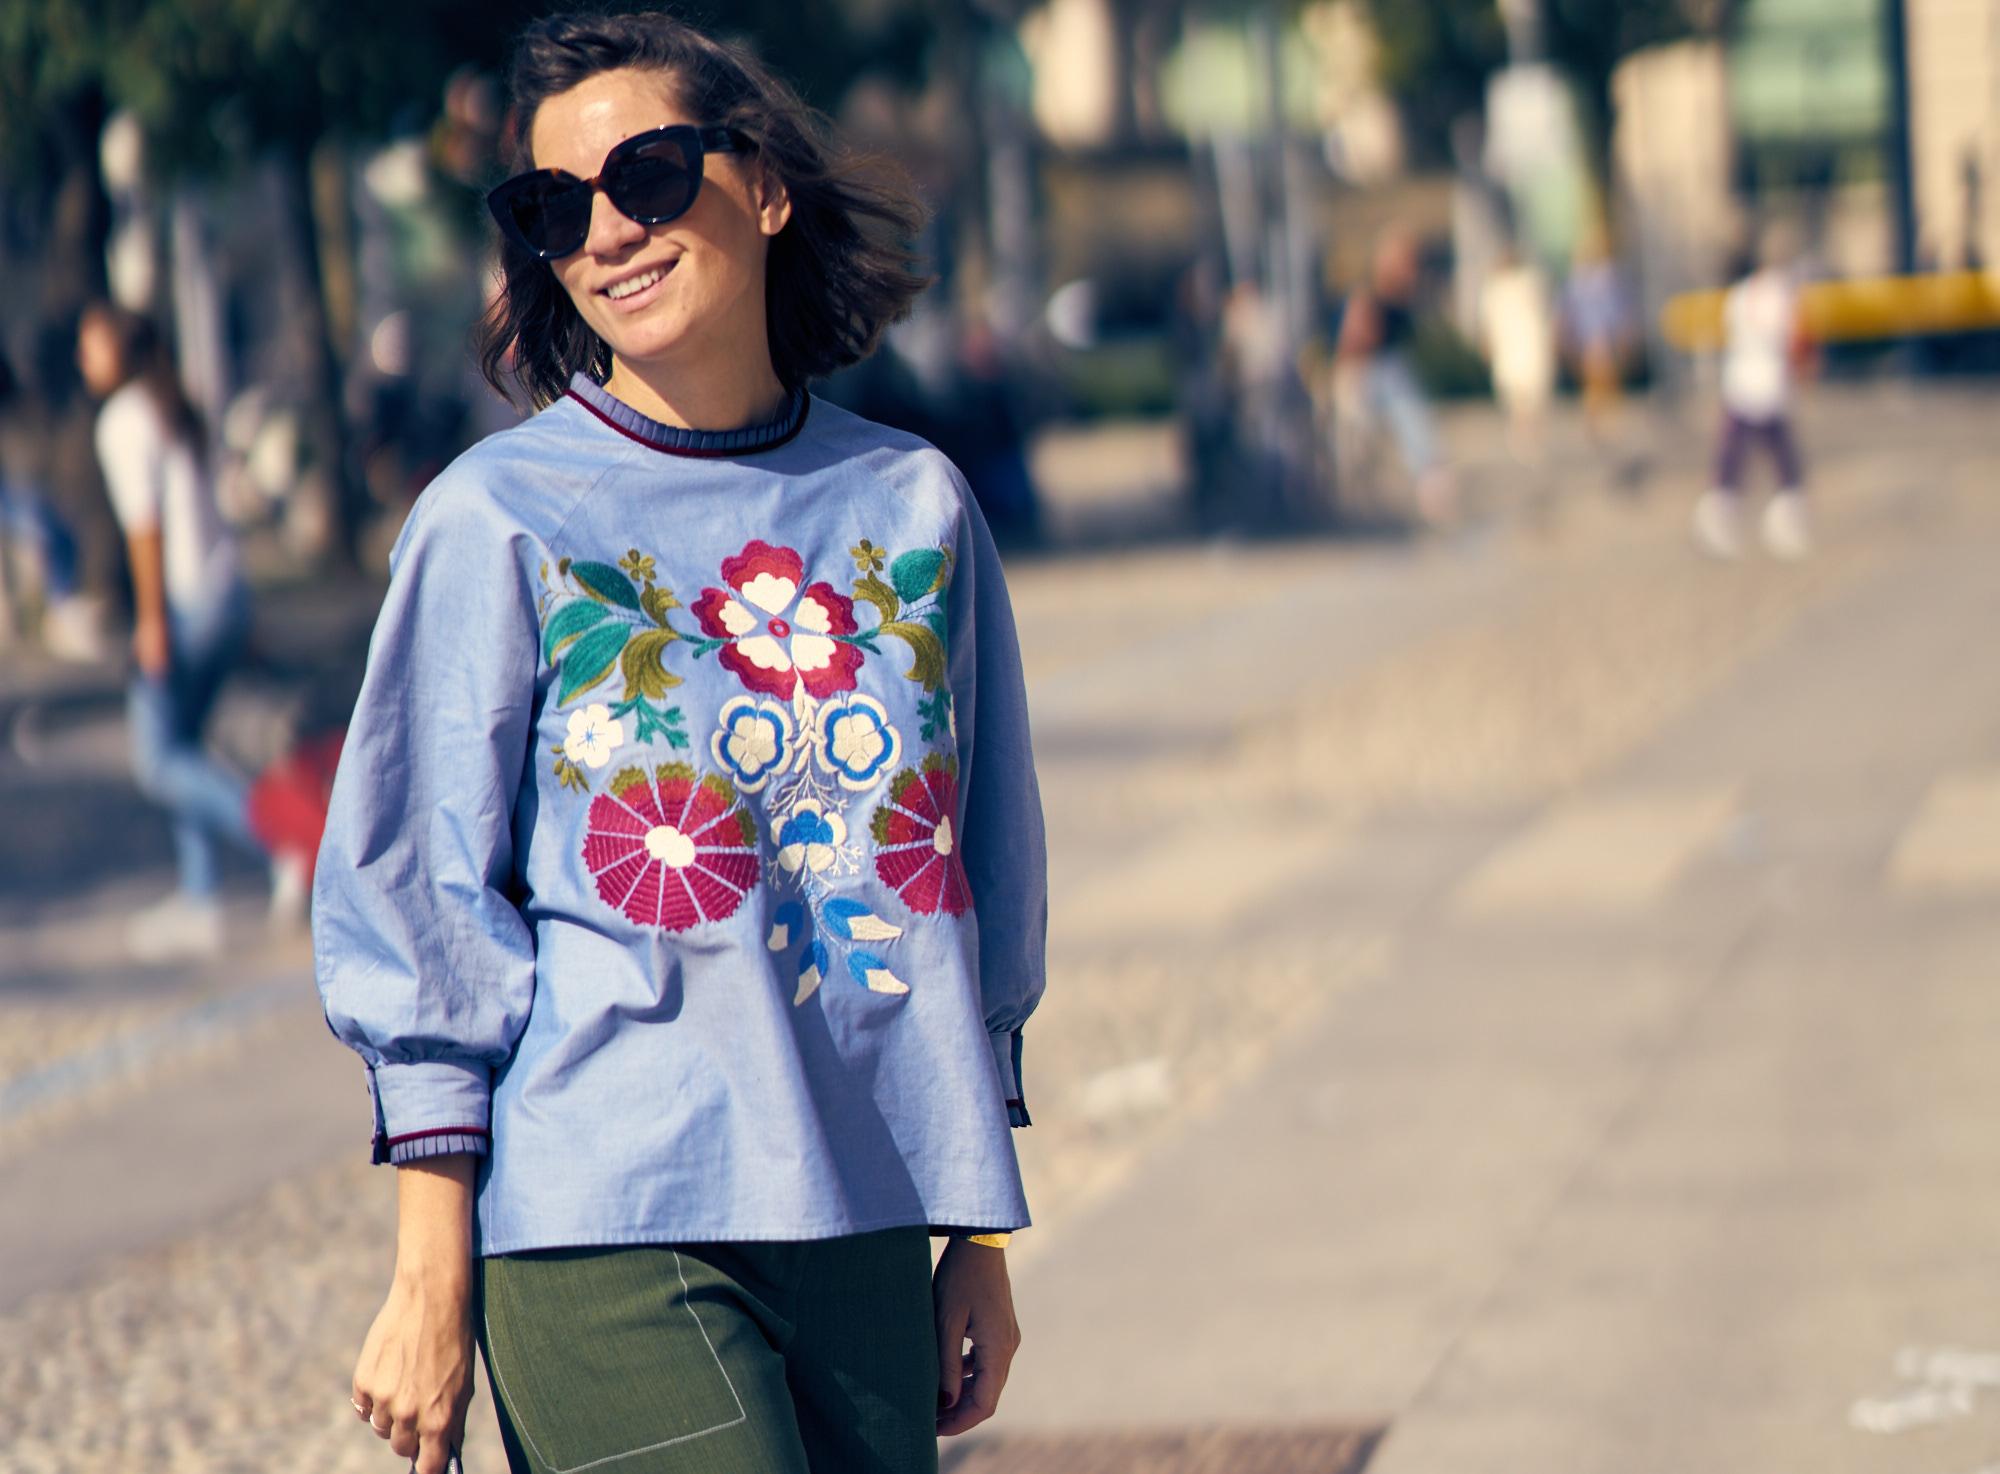 billur saatci, offnegiysem, street style, turkish style blogger, lug von siga, celine, misela, see by chloe, marine, milano, billurmilandiary, milan street style, milan